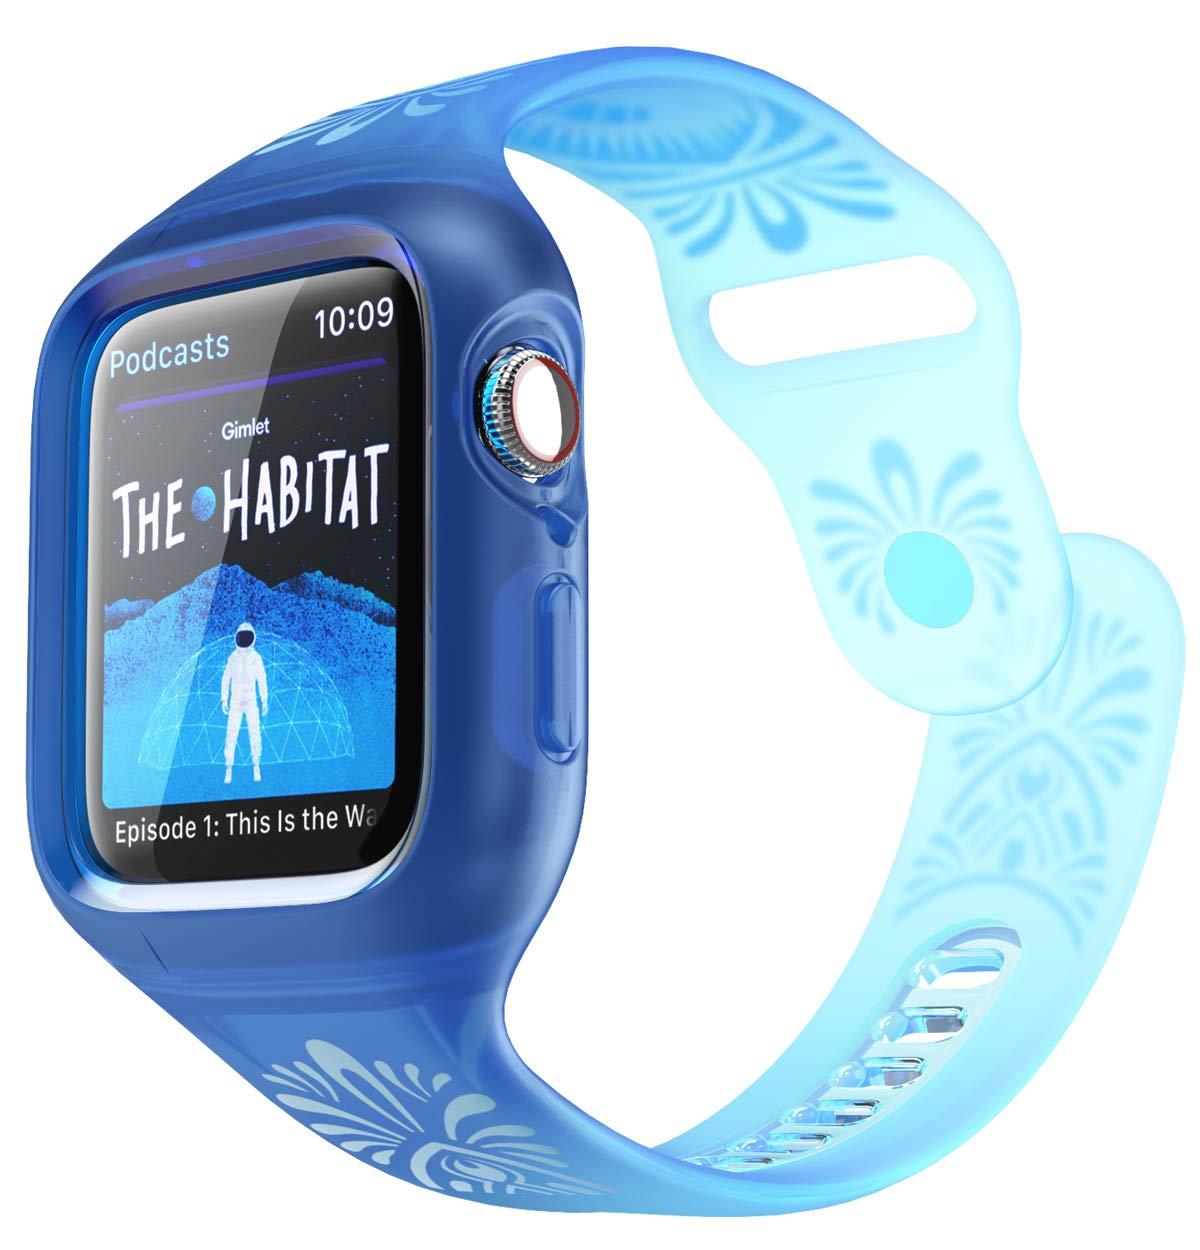 i-Blason Bands Designed for Apple Watch 44mm Series 4, Flora Series Premium Hybrid Bumper Protective Case for Apple Watch 44 mm 2018 Release (Navy) by i-Blason